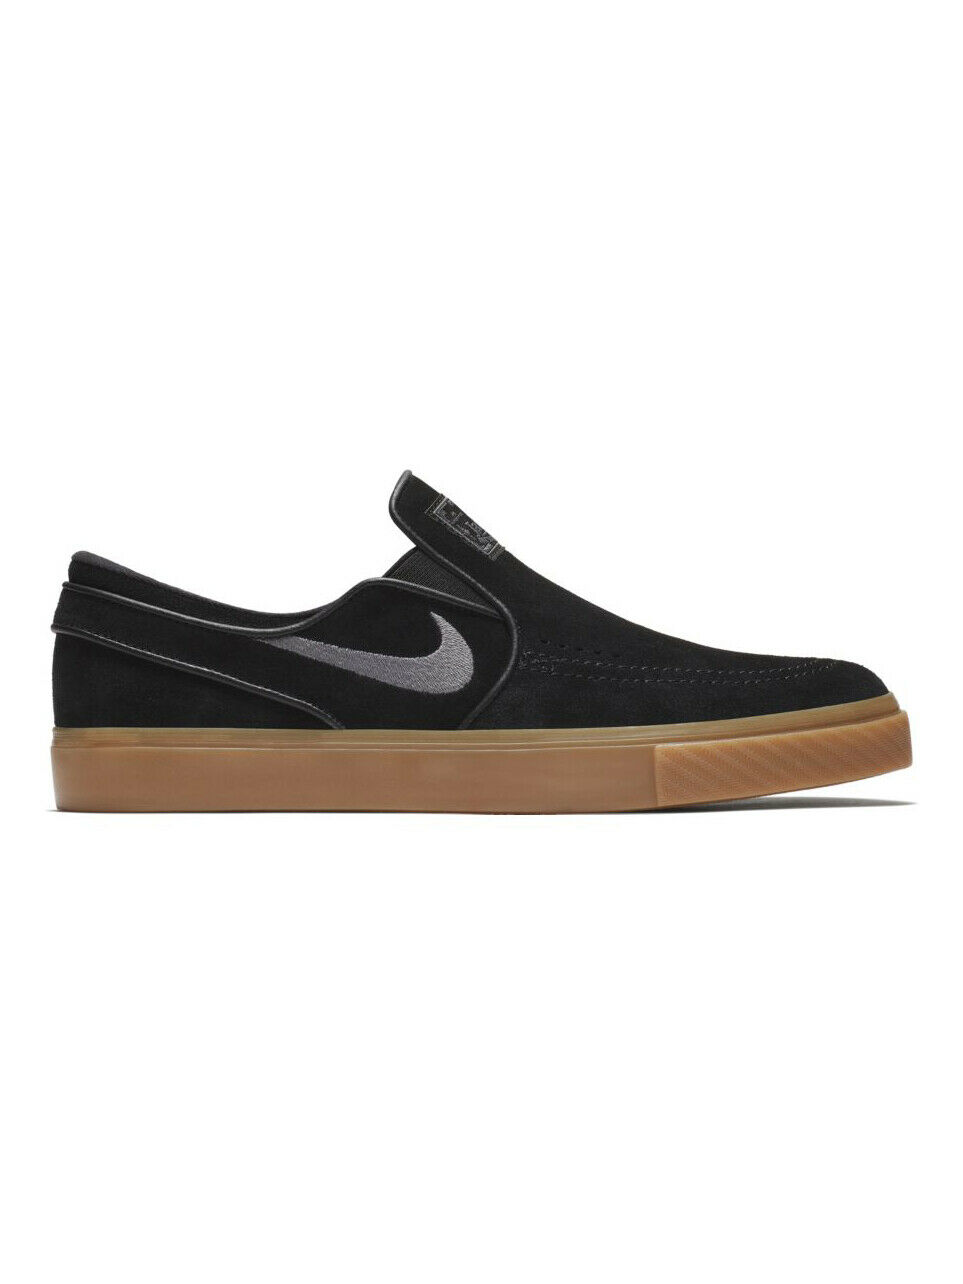 personal Sicilia Desafío  Nike SB Stefan Janoski 333824-069 Thunder Grey Black Gum Skate Shoes Sz 12  Zoom for sale online   eBay